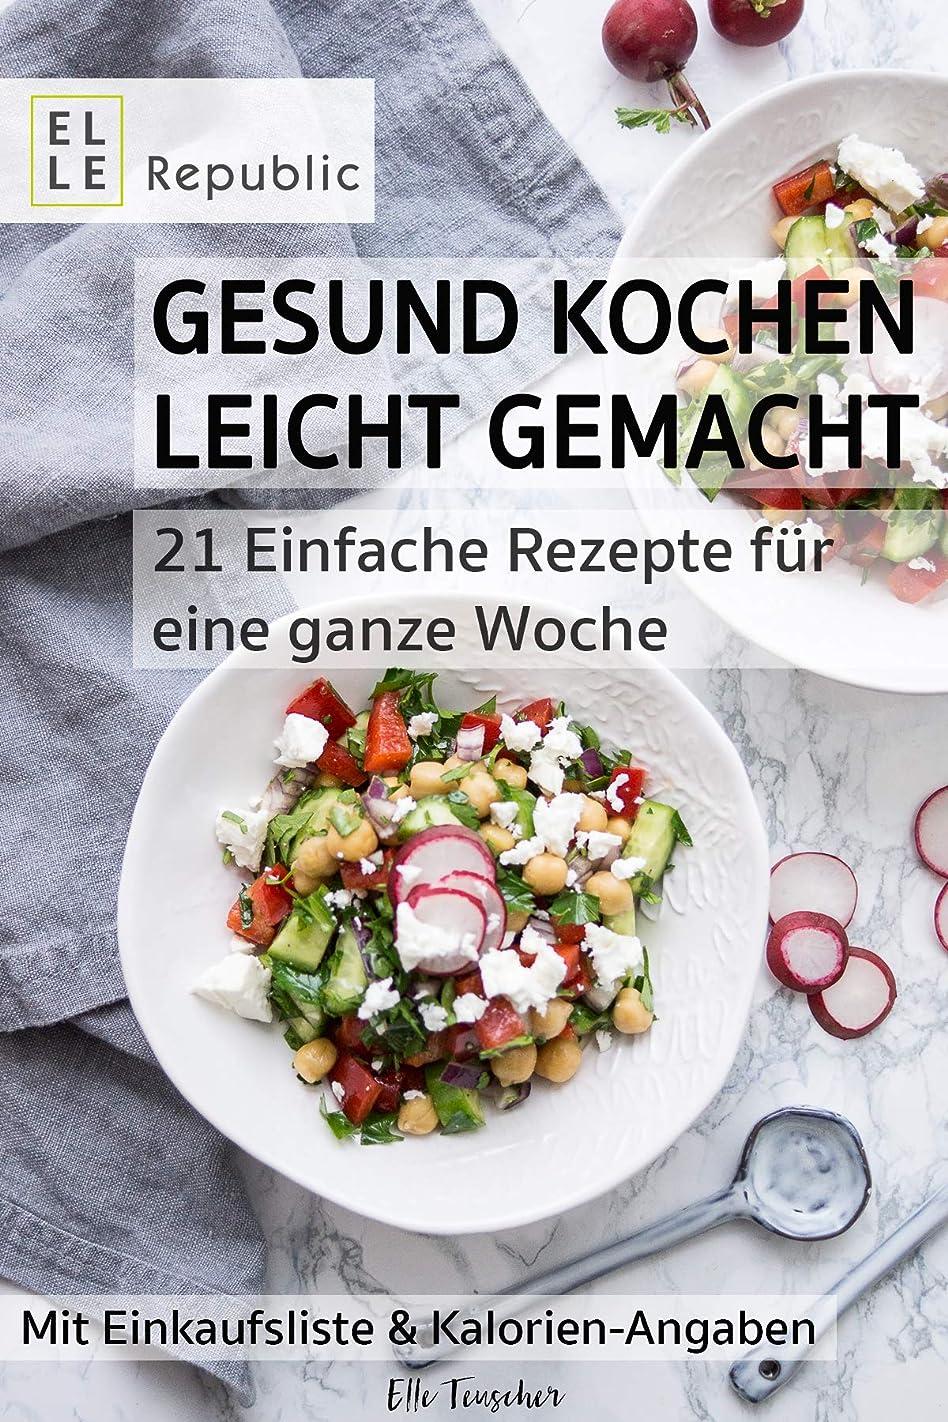 コモランマ等価人工Gesund kochen leicht gemacht: 21 Einfache Rezepte für eine ganze Woche (German Edition)